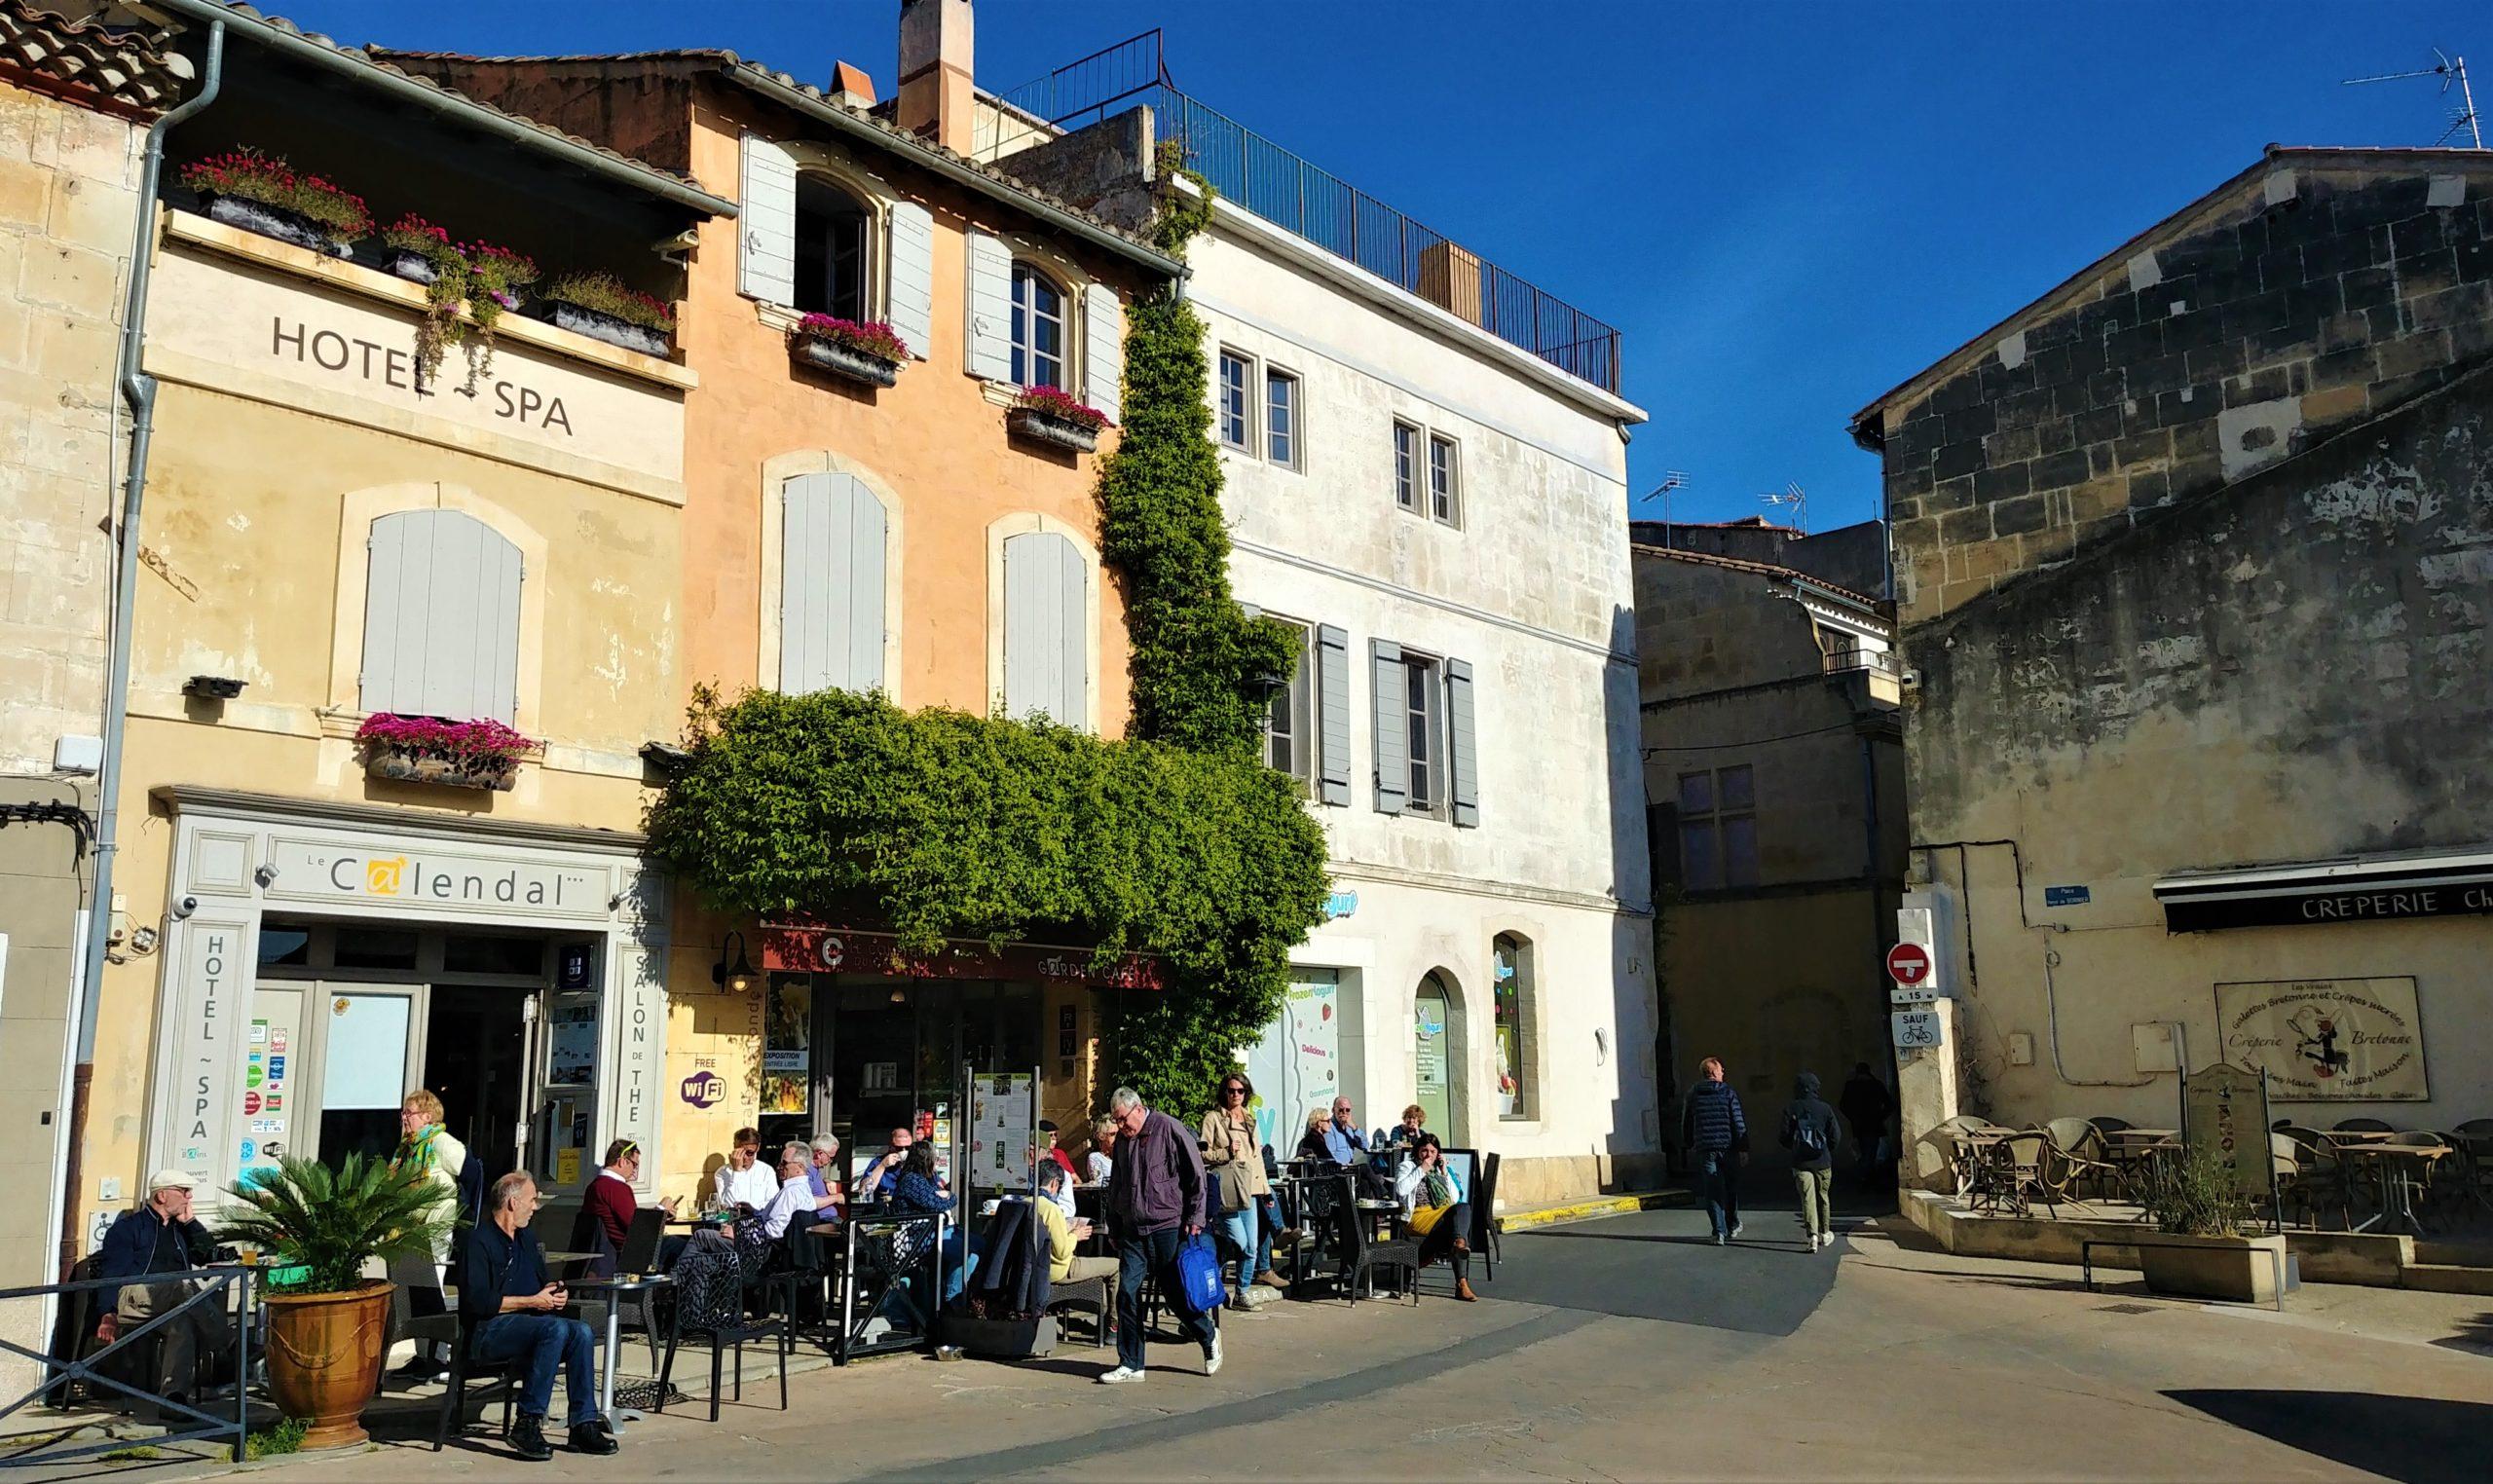 Arles hotels où dormir bonnes adresses blog voyage provence